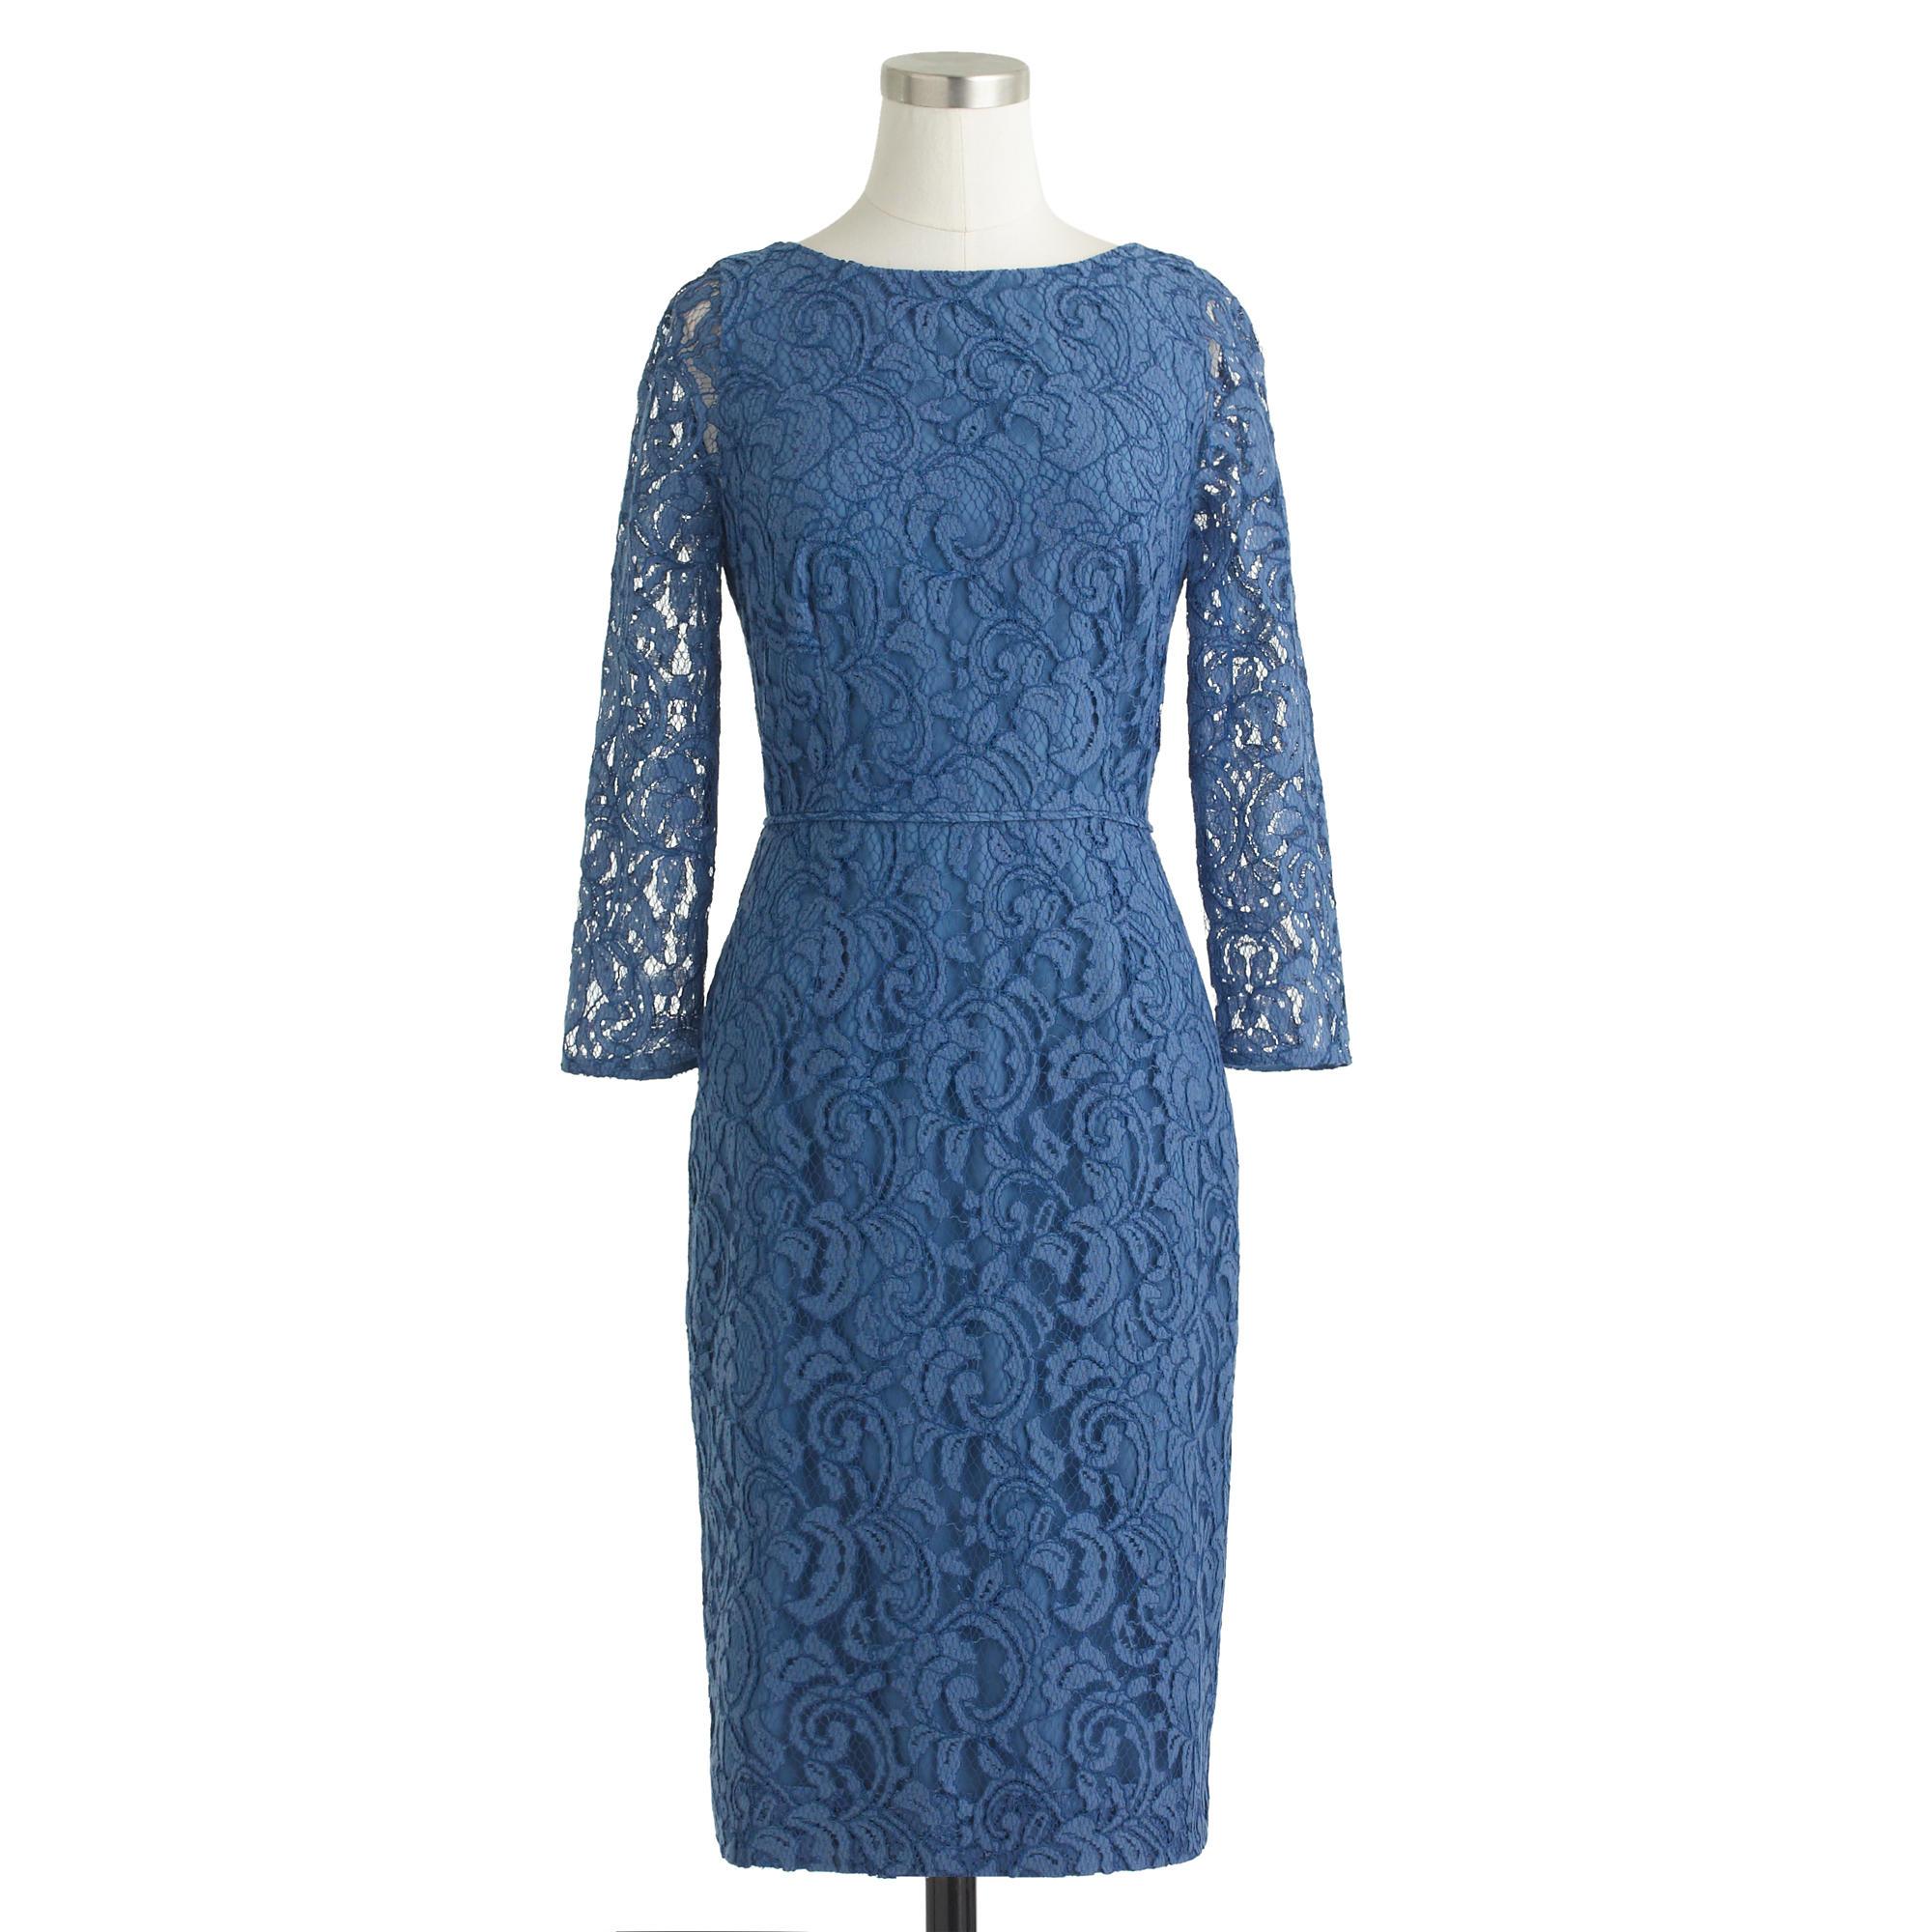 J.crew Petite Natalia Dress In Leavers Lace In Blue